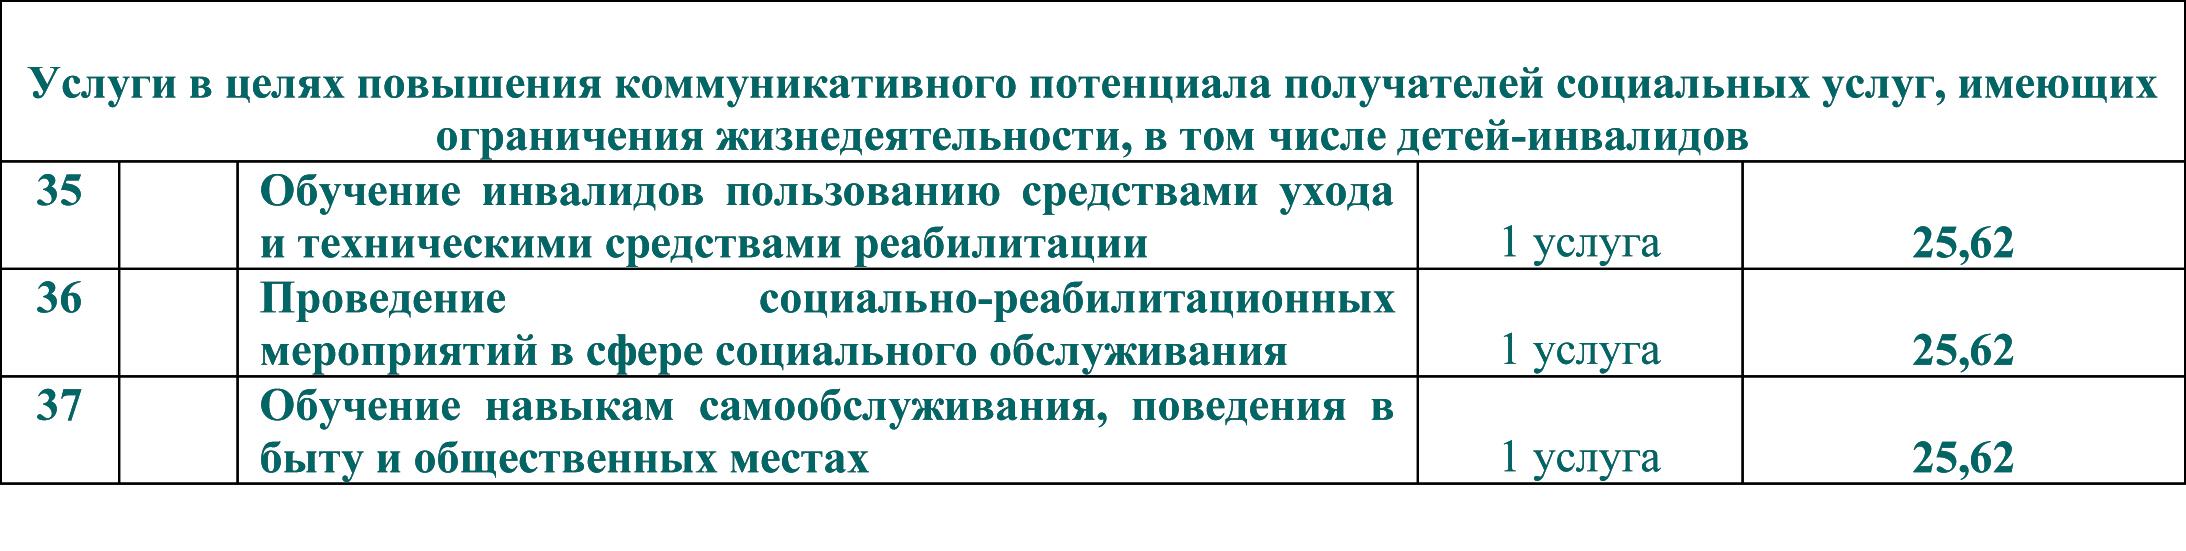 tarif-sro-csonekl-2019-3